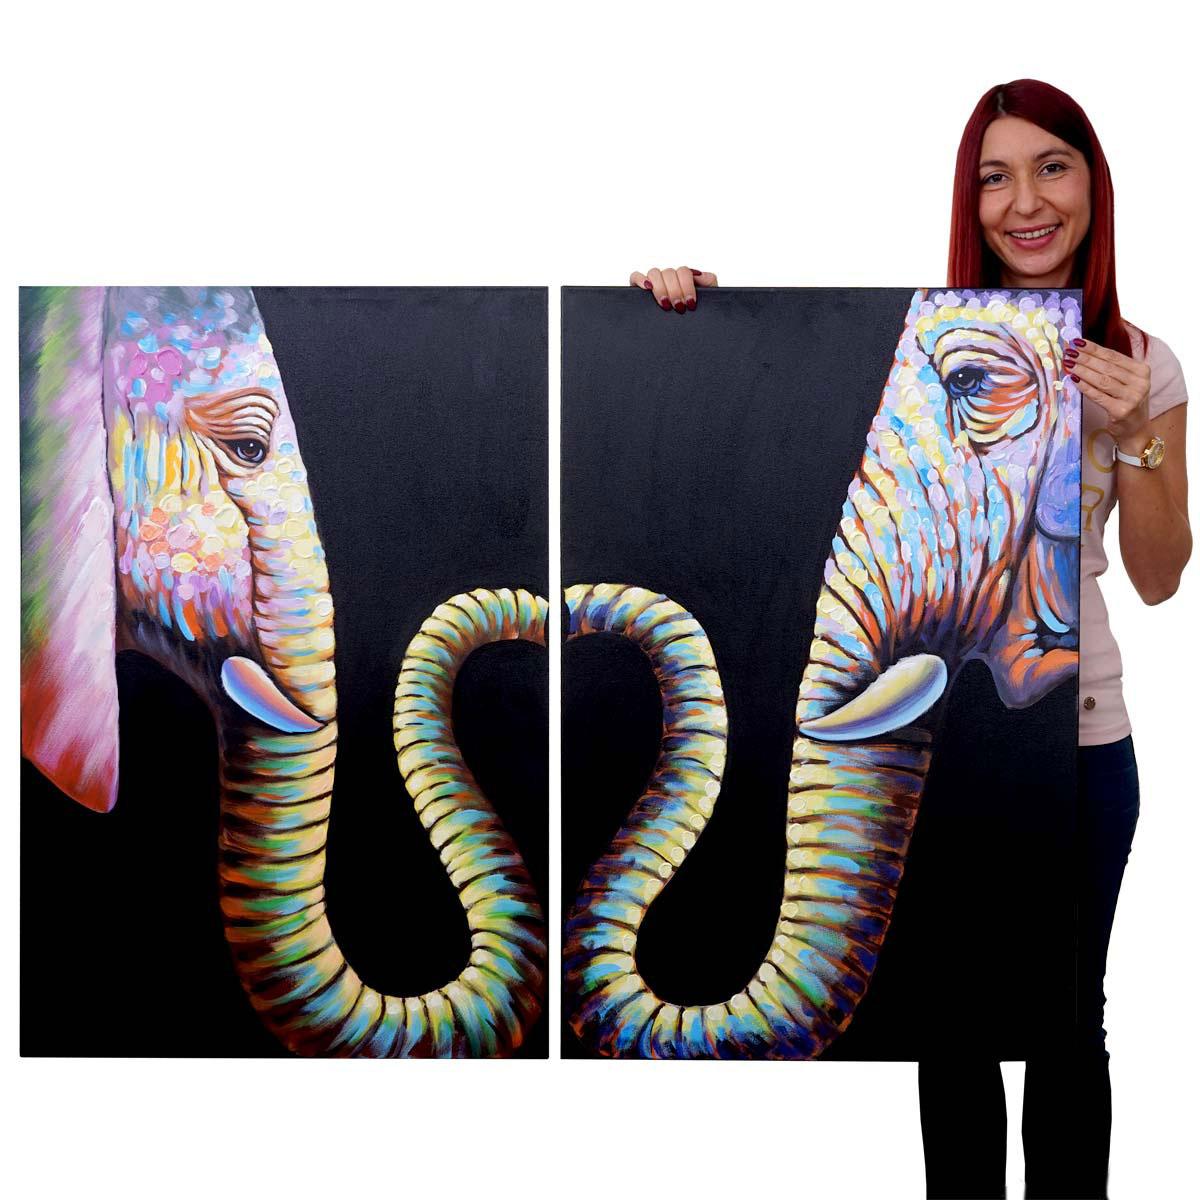 Mendler Ölgemälde 2x Elefant, 100% handgemaltes Wandbild Gemälde XL, 90x60cm ~ Variantenangebot 51280